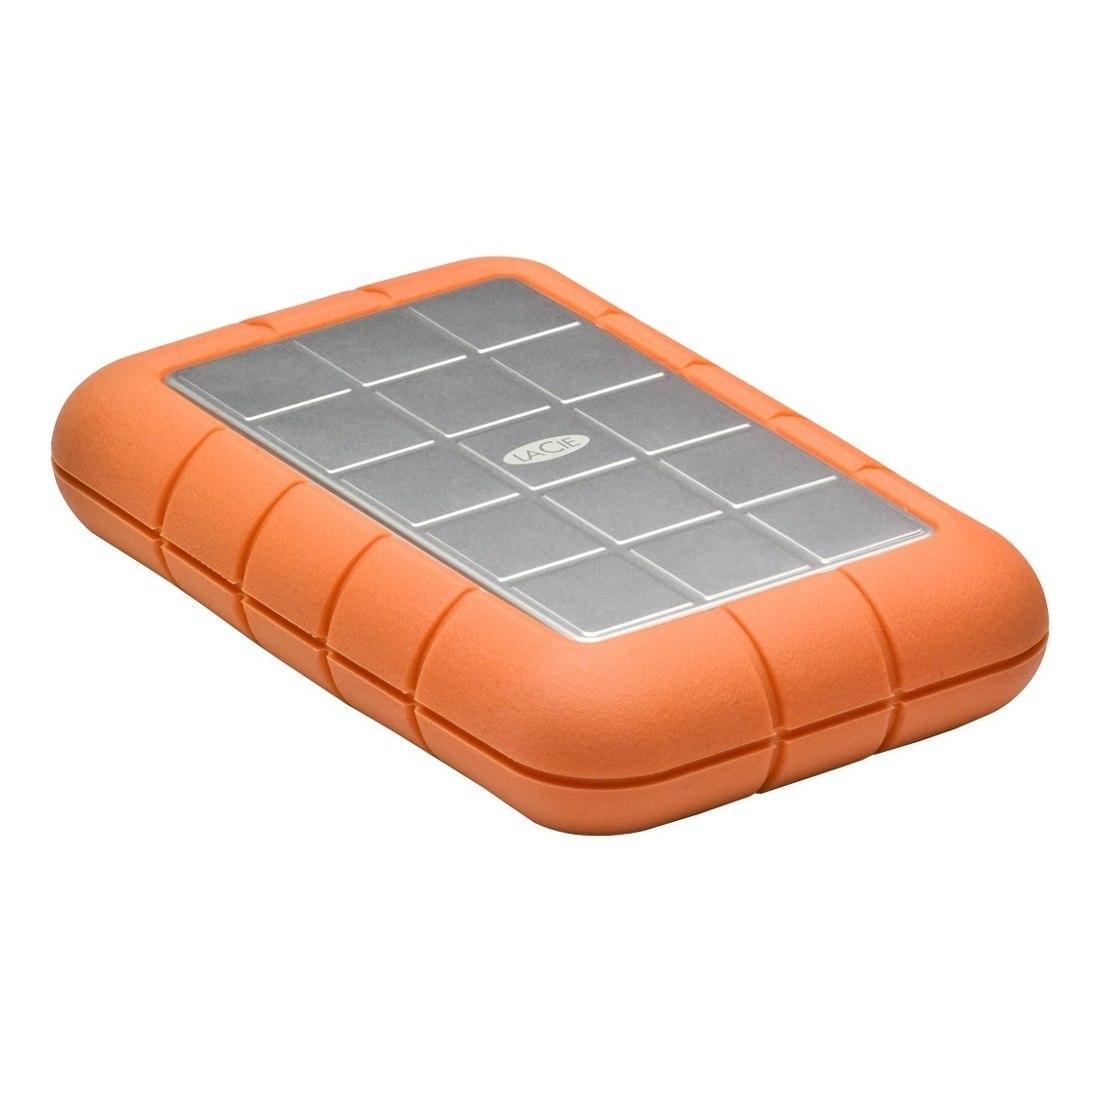 Lacie Rugged Triple 2 Tb External Hard Drive Sata Portable